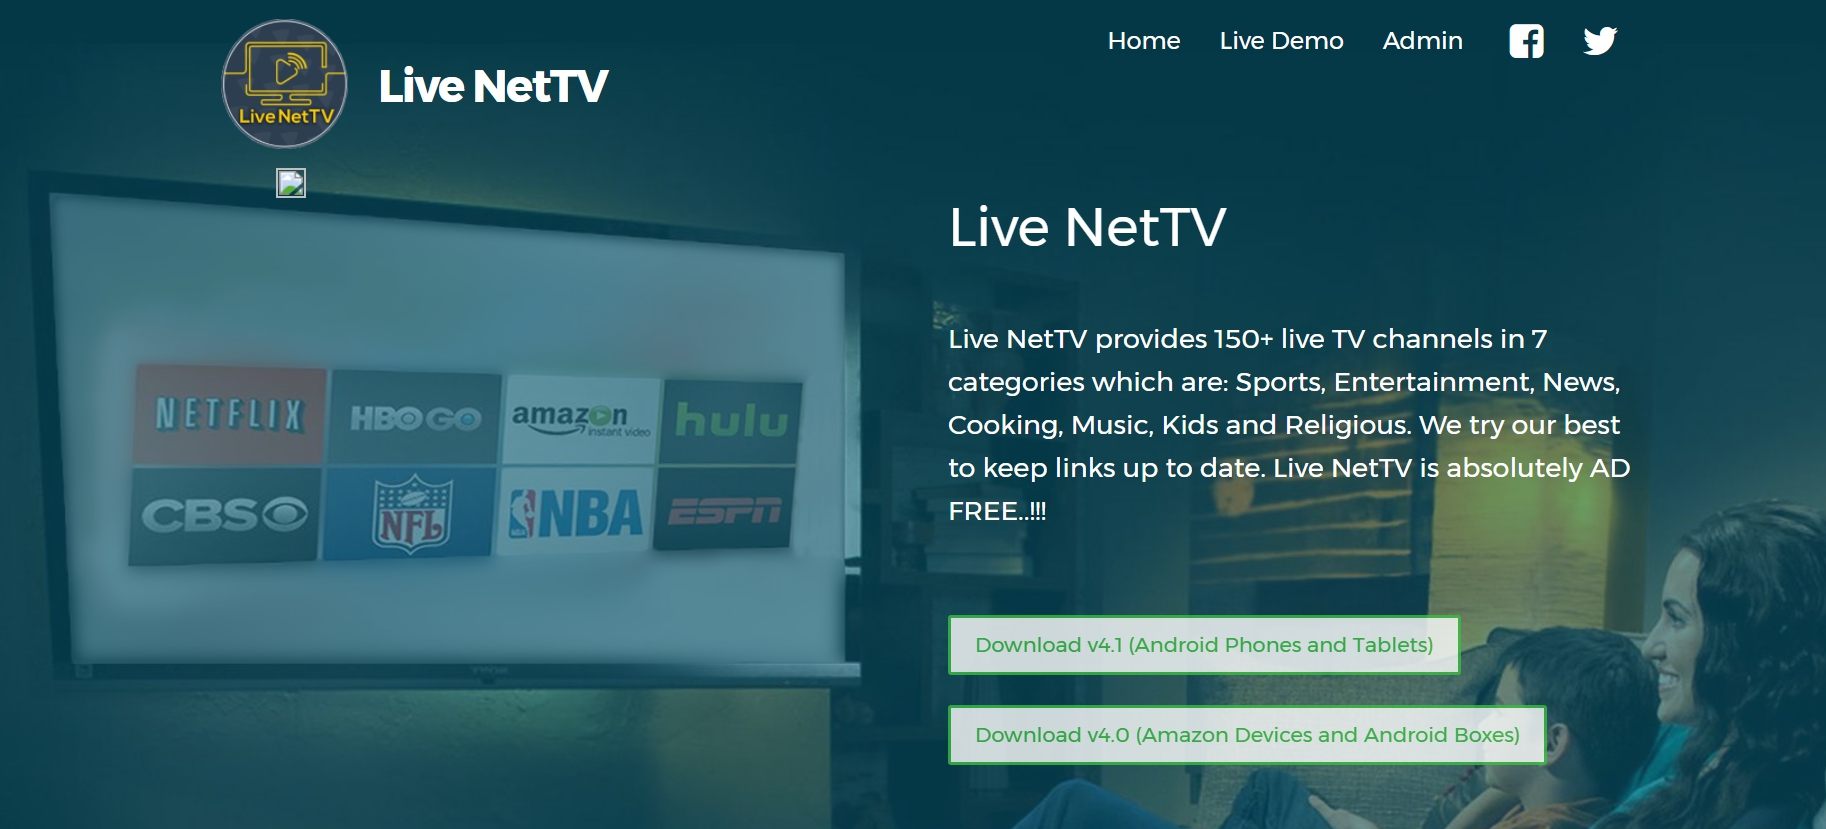 Live_NetTv_Apk_Best_Android_tv_App